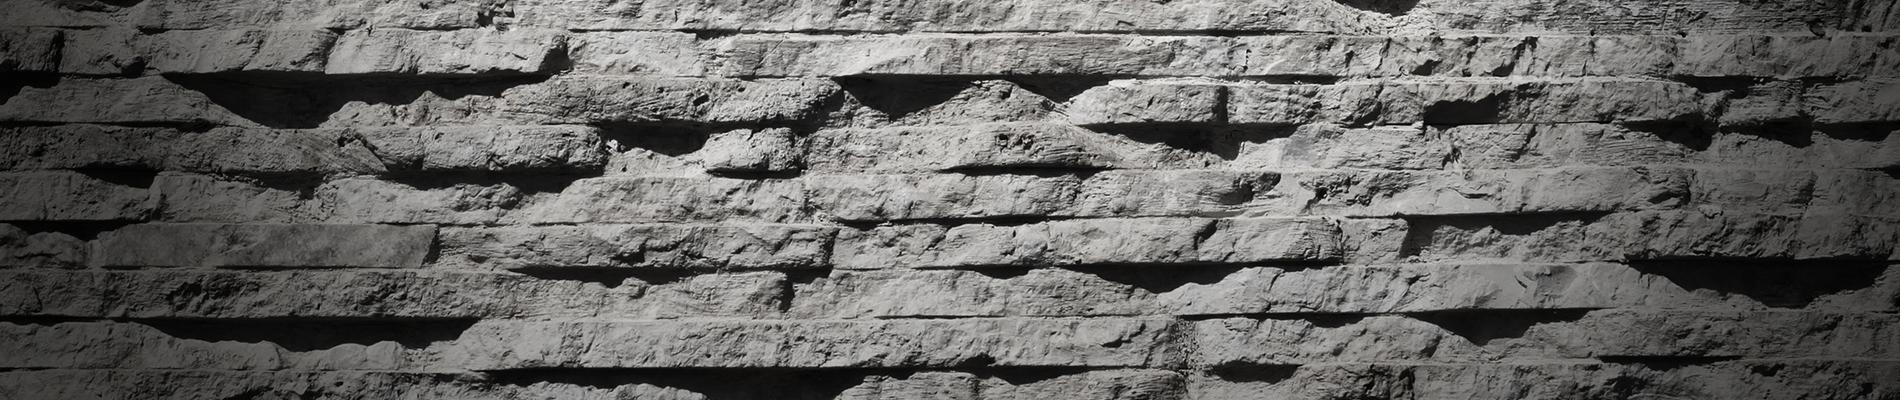 brickwall8